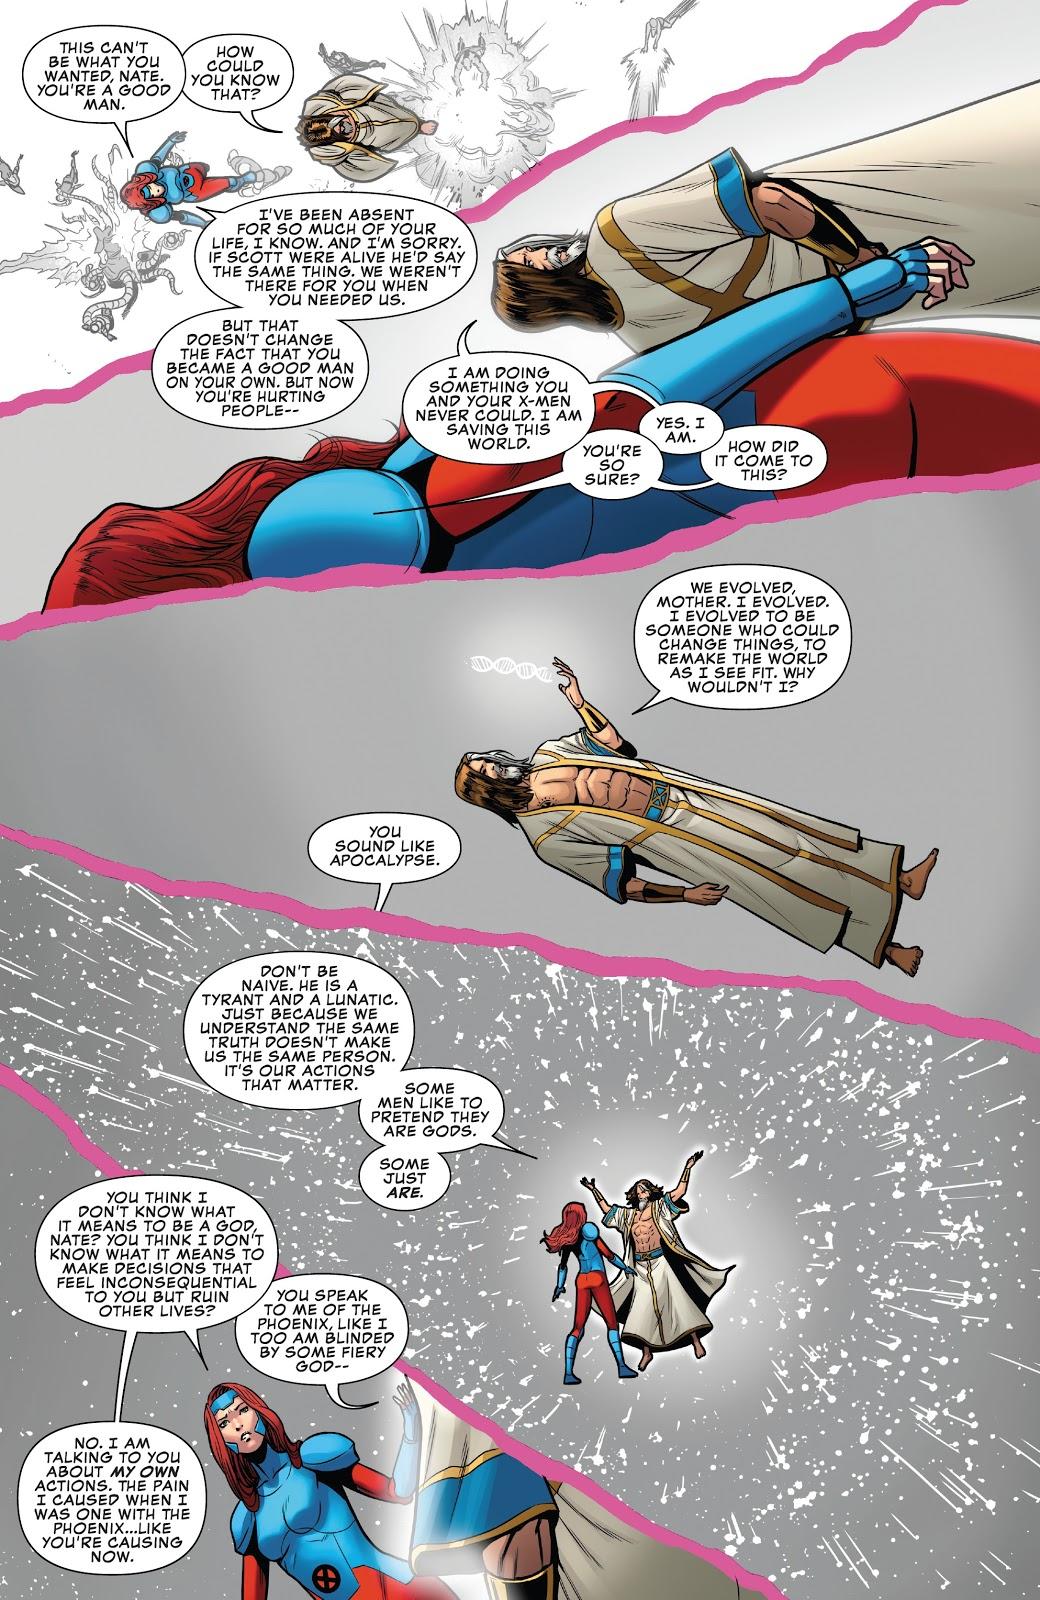 Jean Grey VS X-Man (X-Men Disassembled)